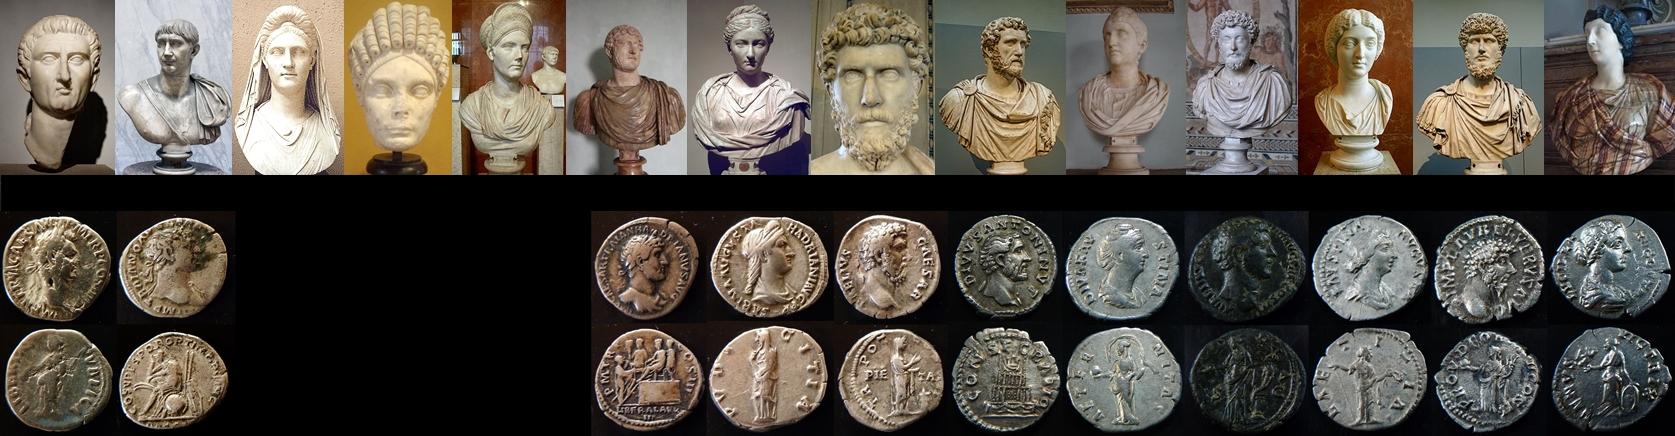 Mis Personalidades Imperiales Romanas (Gracias @JMR por la idea ) 2ezu0ki